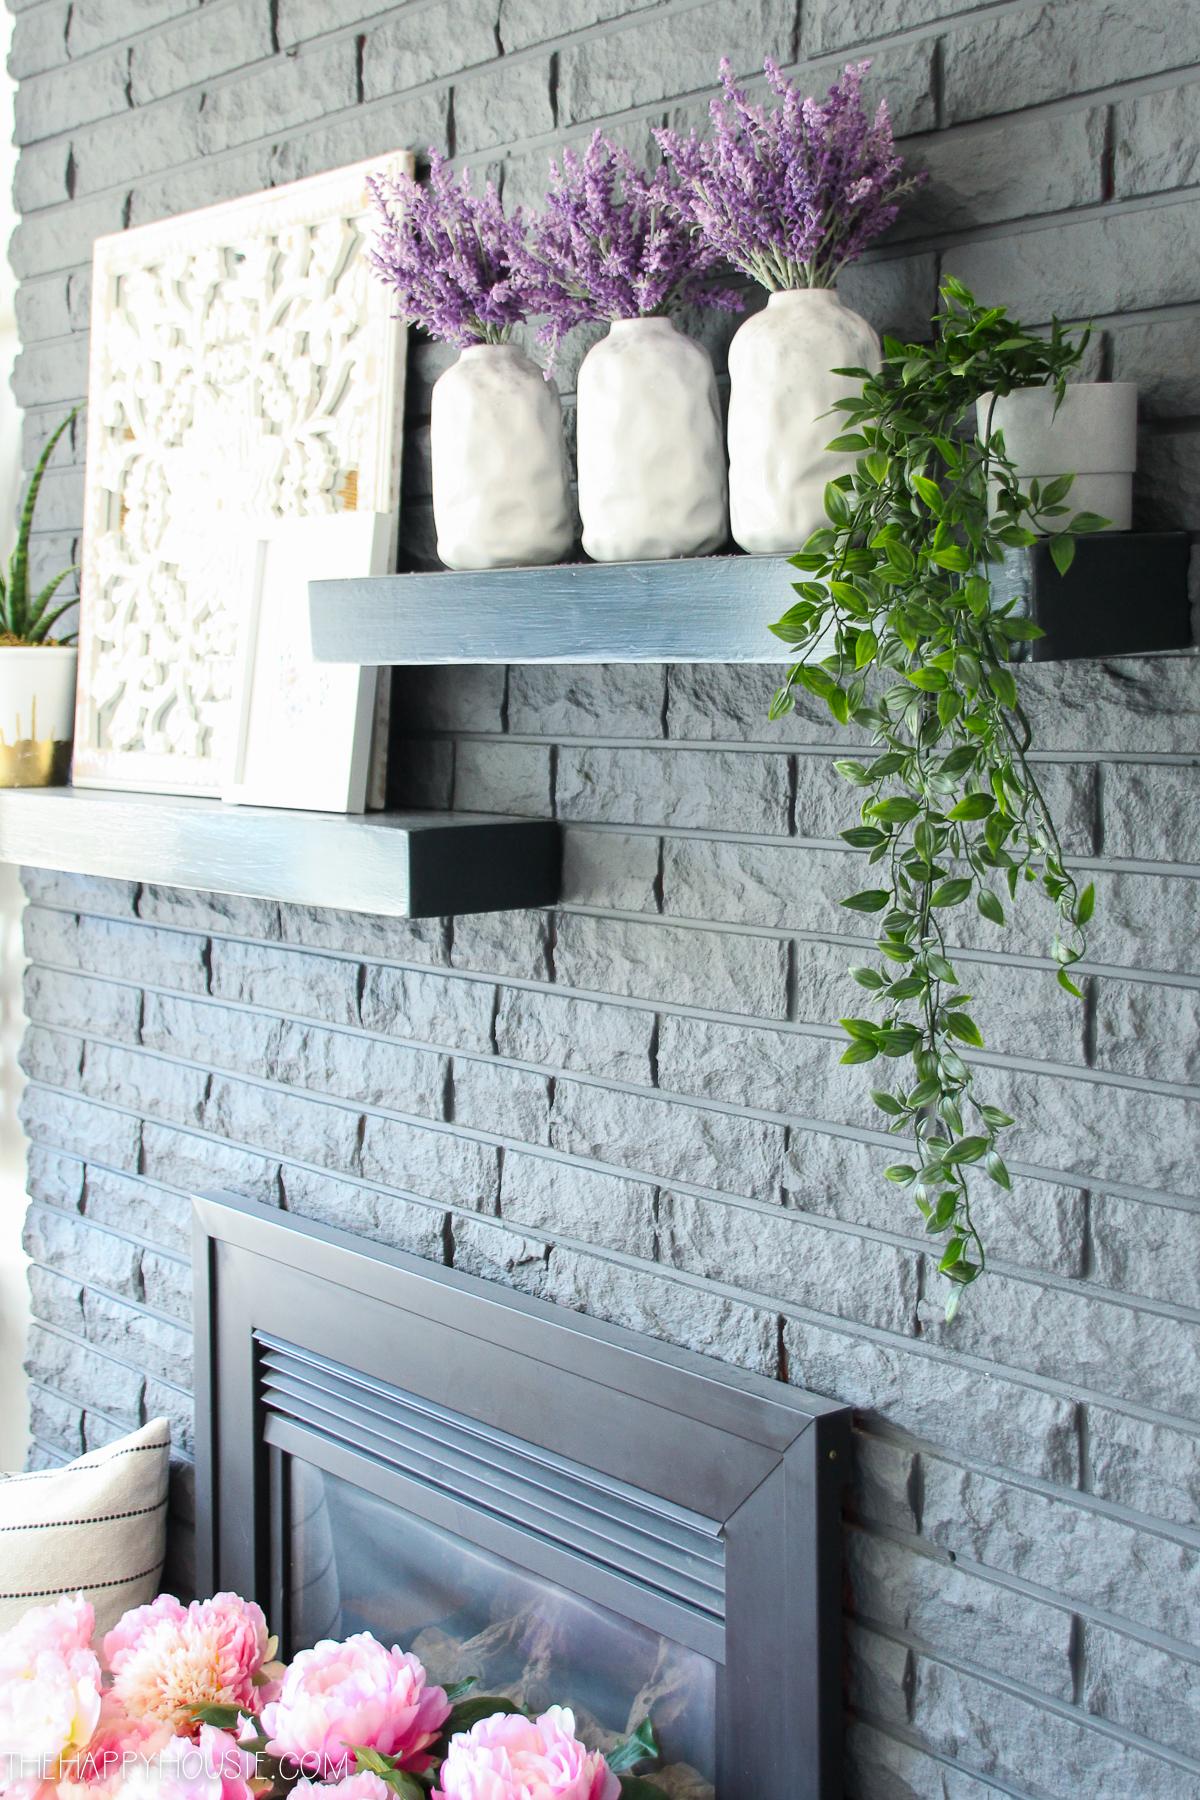 The grey brick fireplace mantel.